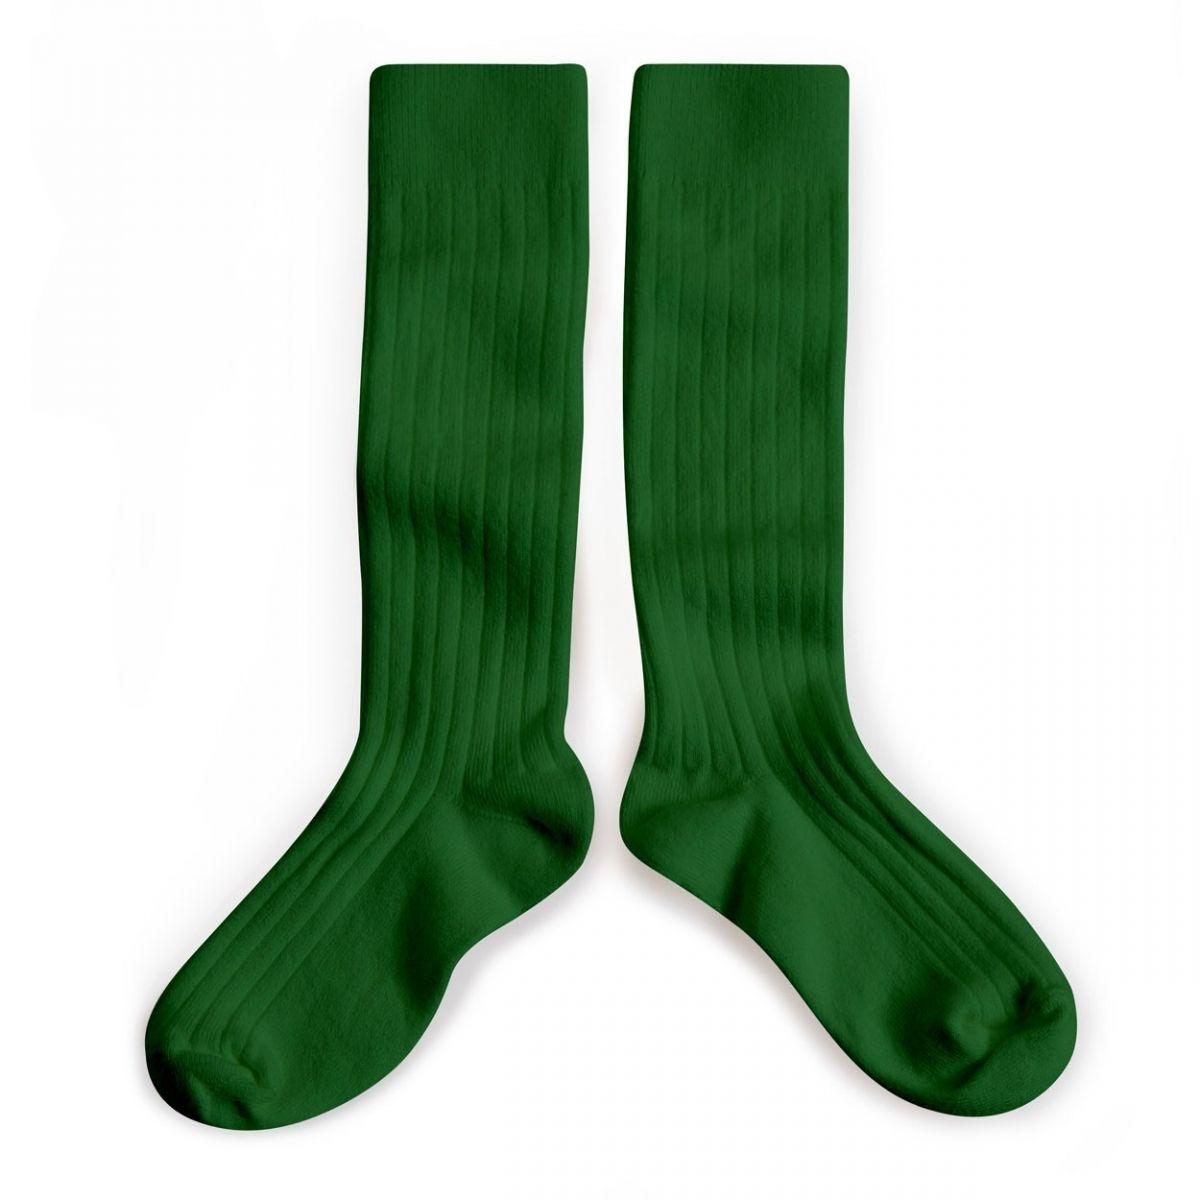 Collégien Podkolanówki Kneesocks Vert Jelly Bean green zielone